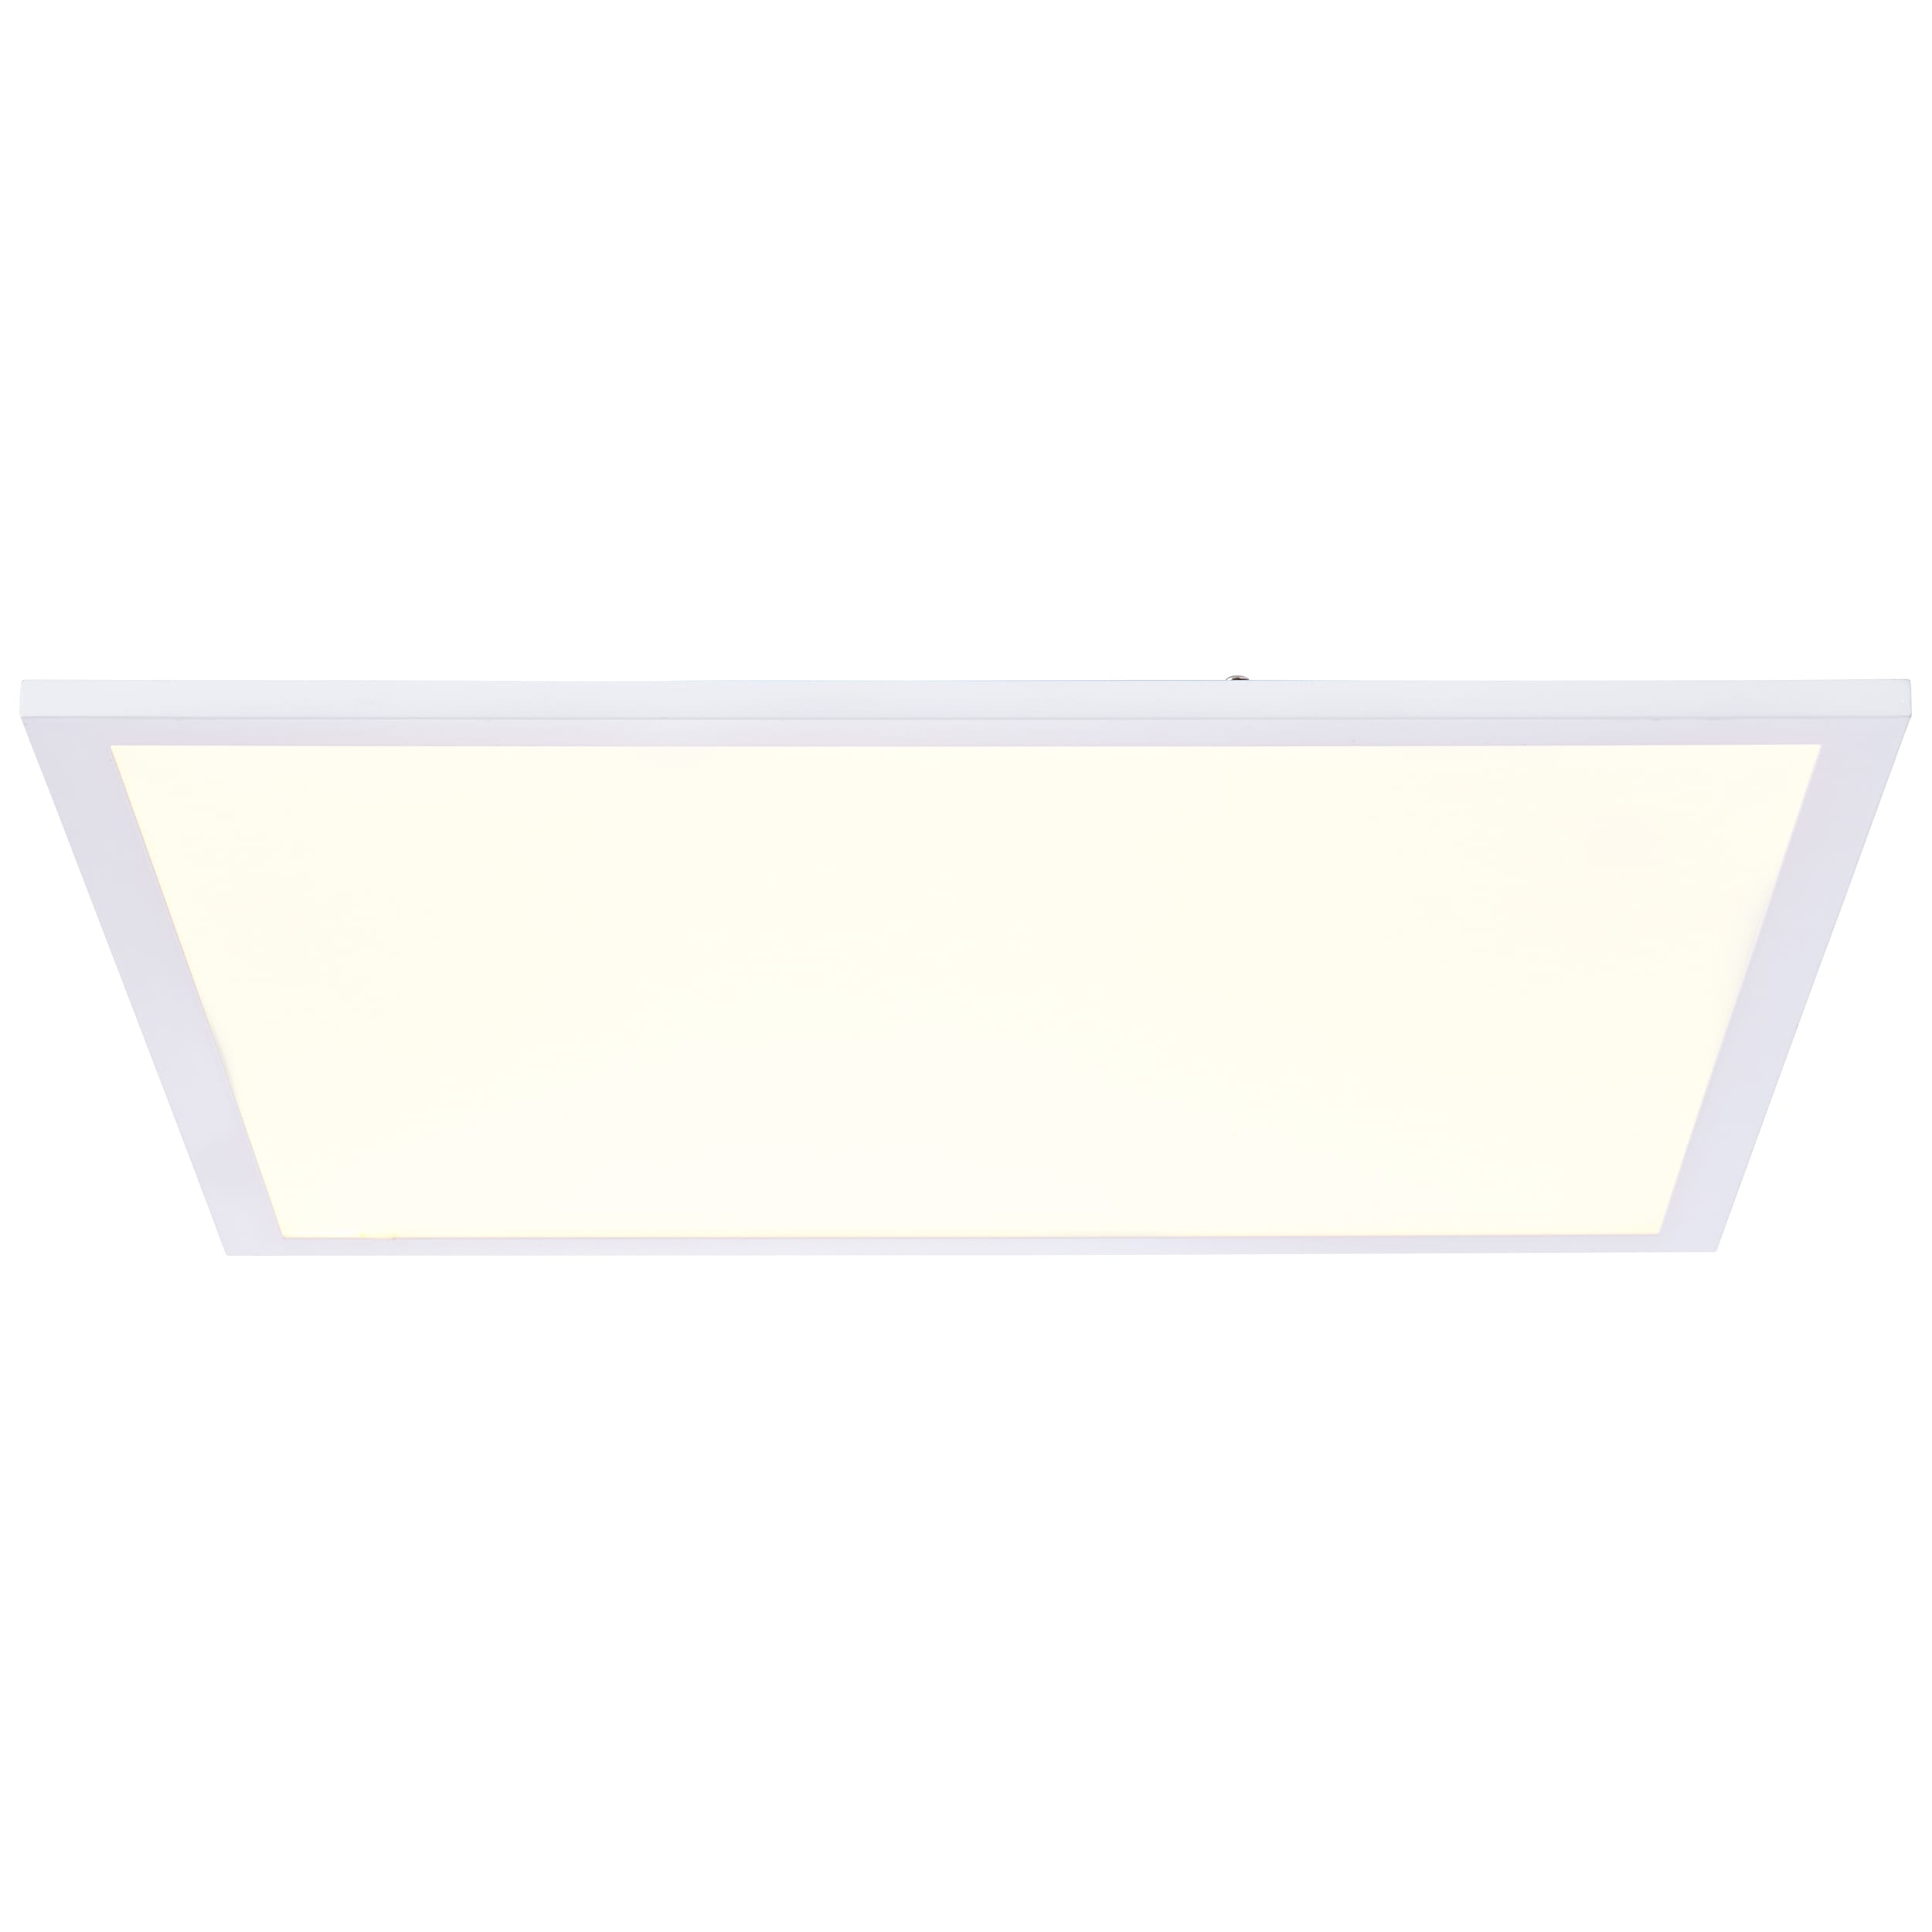 Brilliant Leuchten Charla LED Deckenaufbau-Paneel 75x75cm weiß